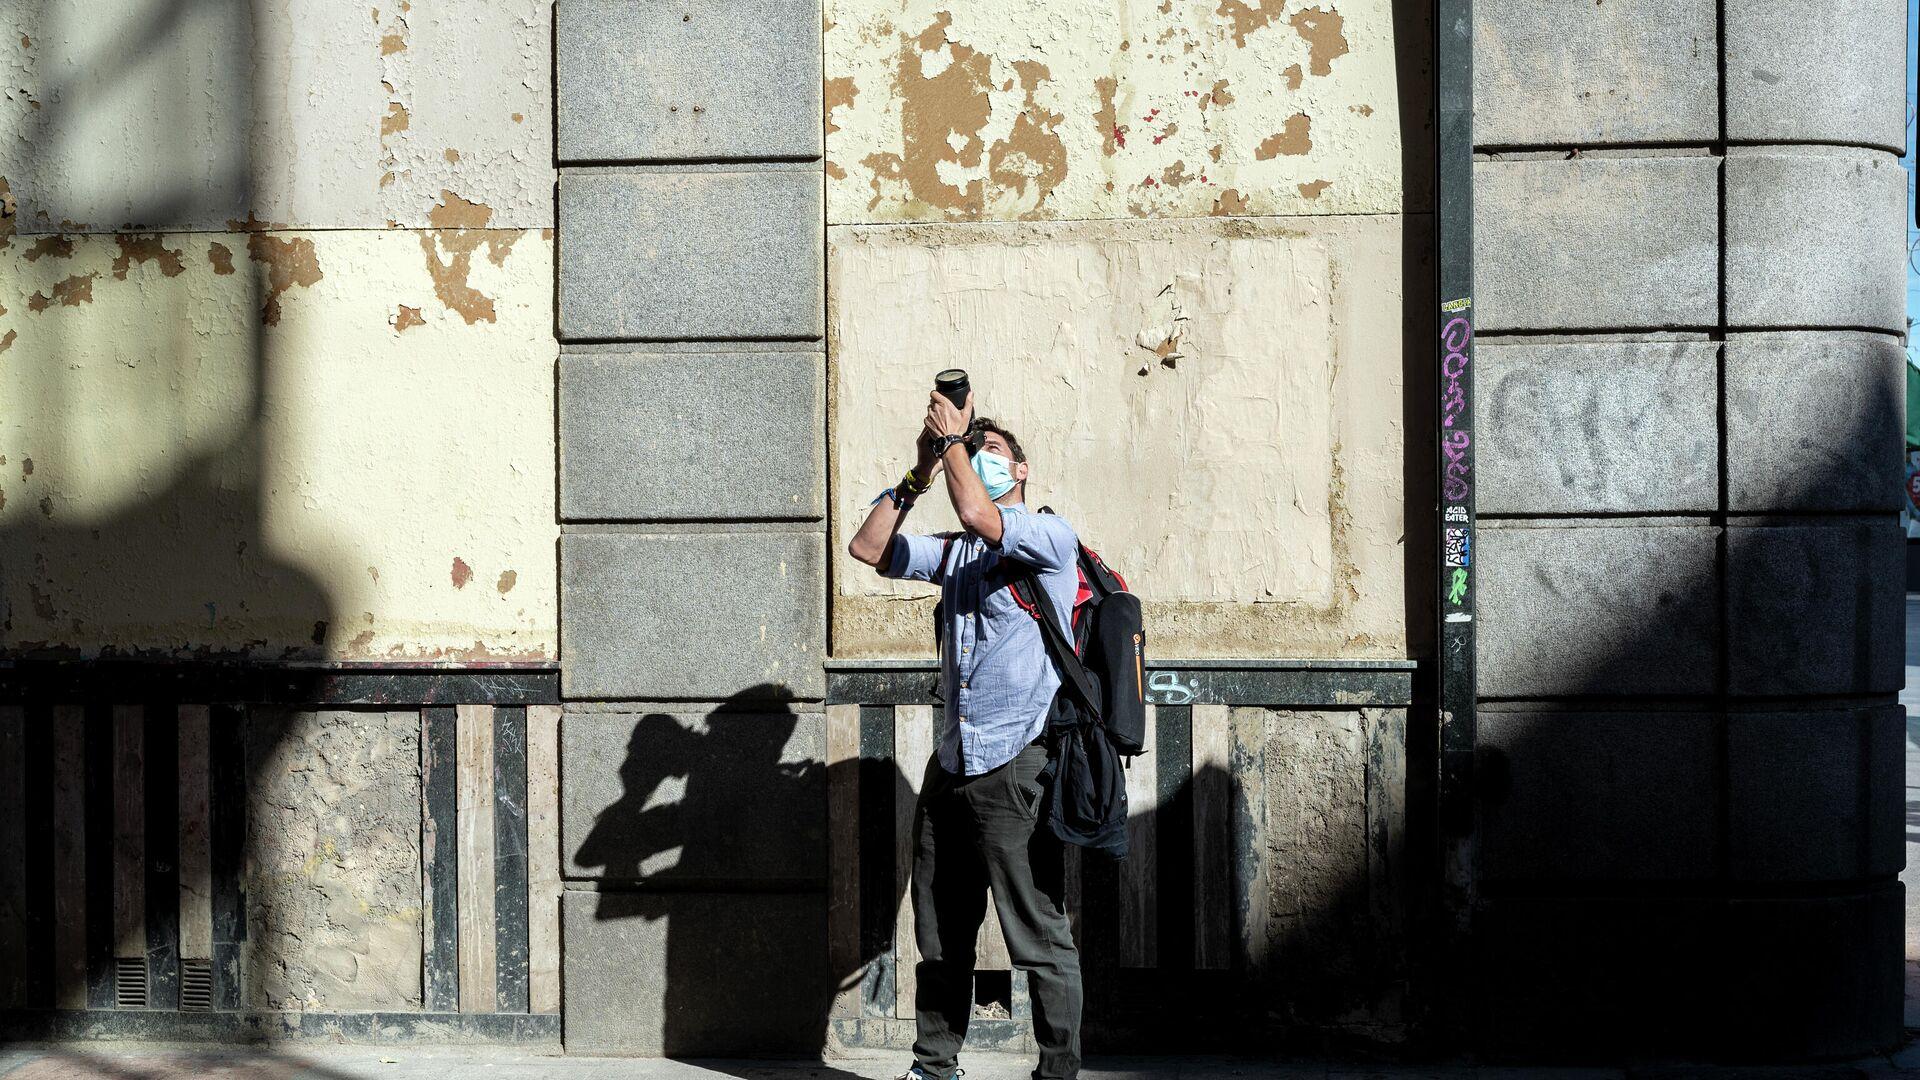 Alberto Menéndez tomando una fotografía cerca de la Plaza Mayor de Madrid - Sputnik Mundo, 1920, 18.05.2021